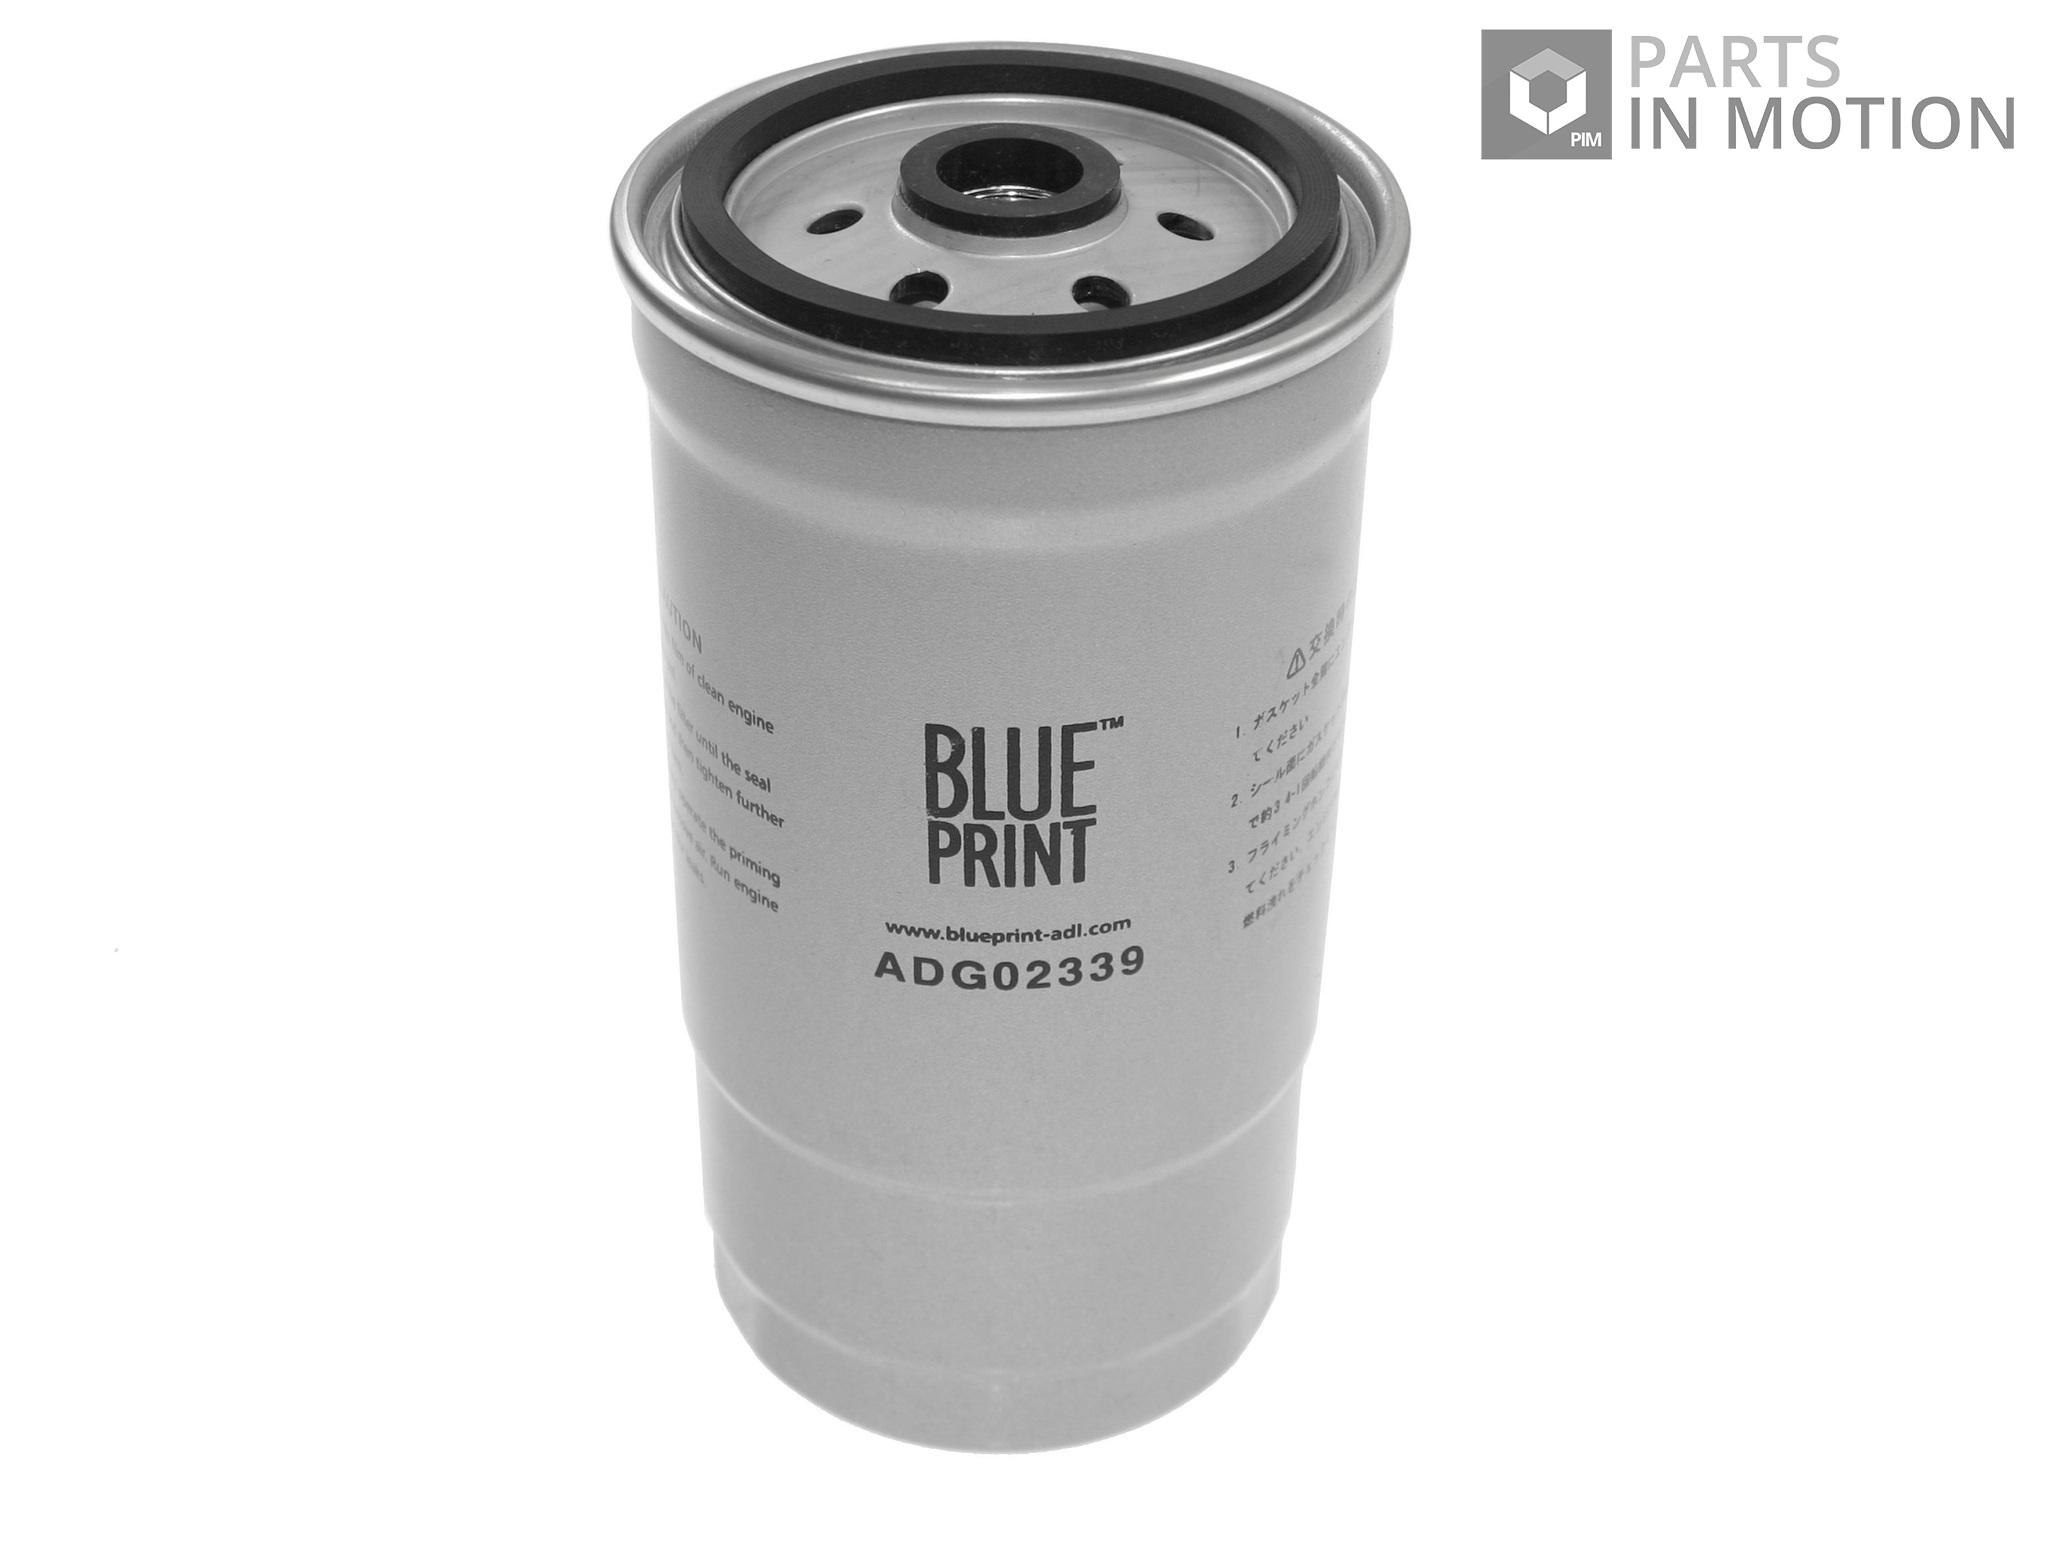 Fuel Filter Fits Kia Sorento Mk1 25d 2002 On D4cb Adl 313003e200 Replacement 2 5d